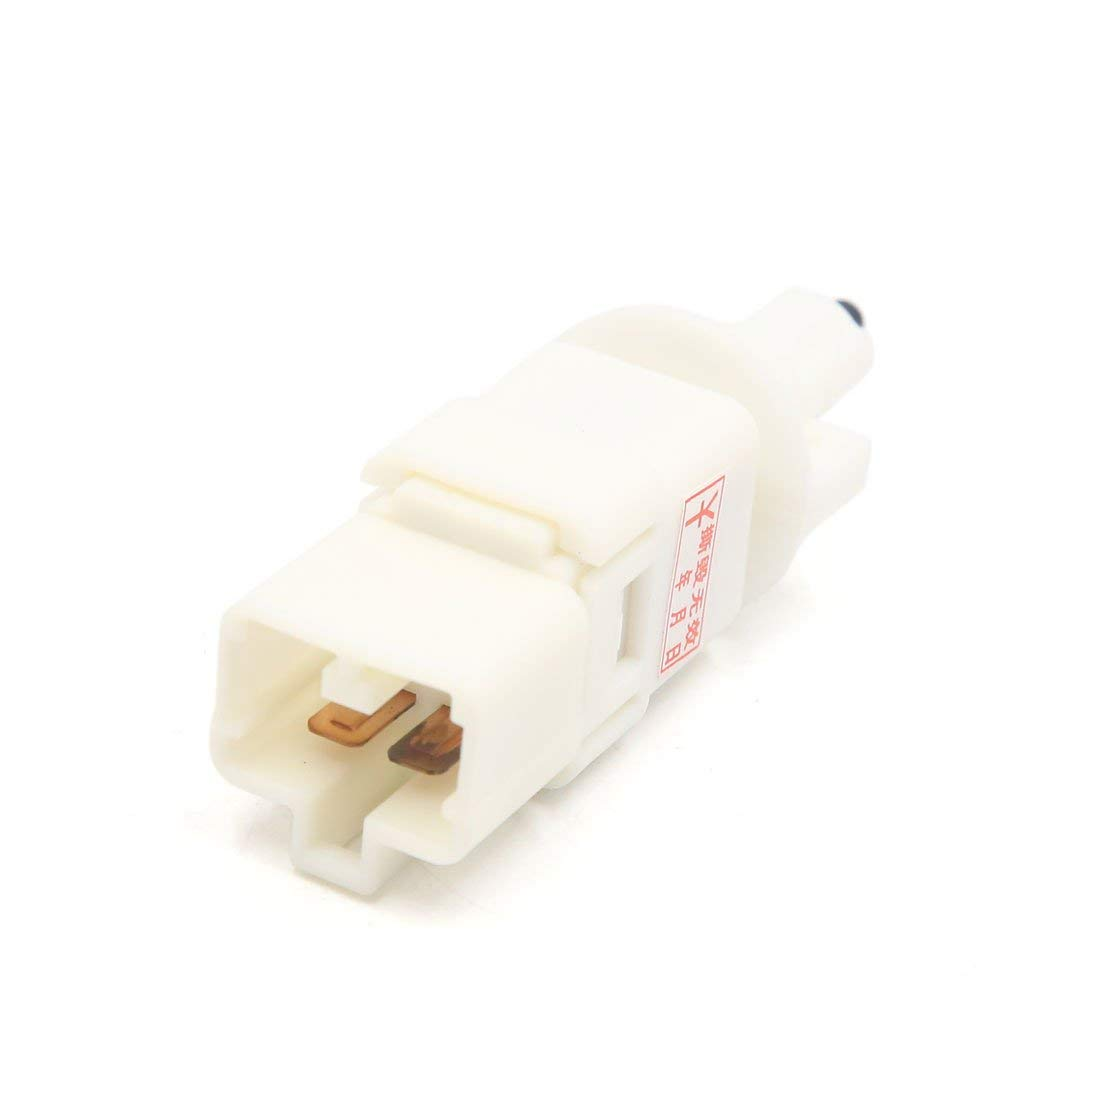 35350-S5A-J03 Car Brake Stop Lamp Light Control Switch for Honda CRV 2002-2011